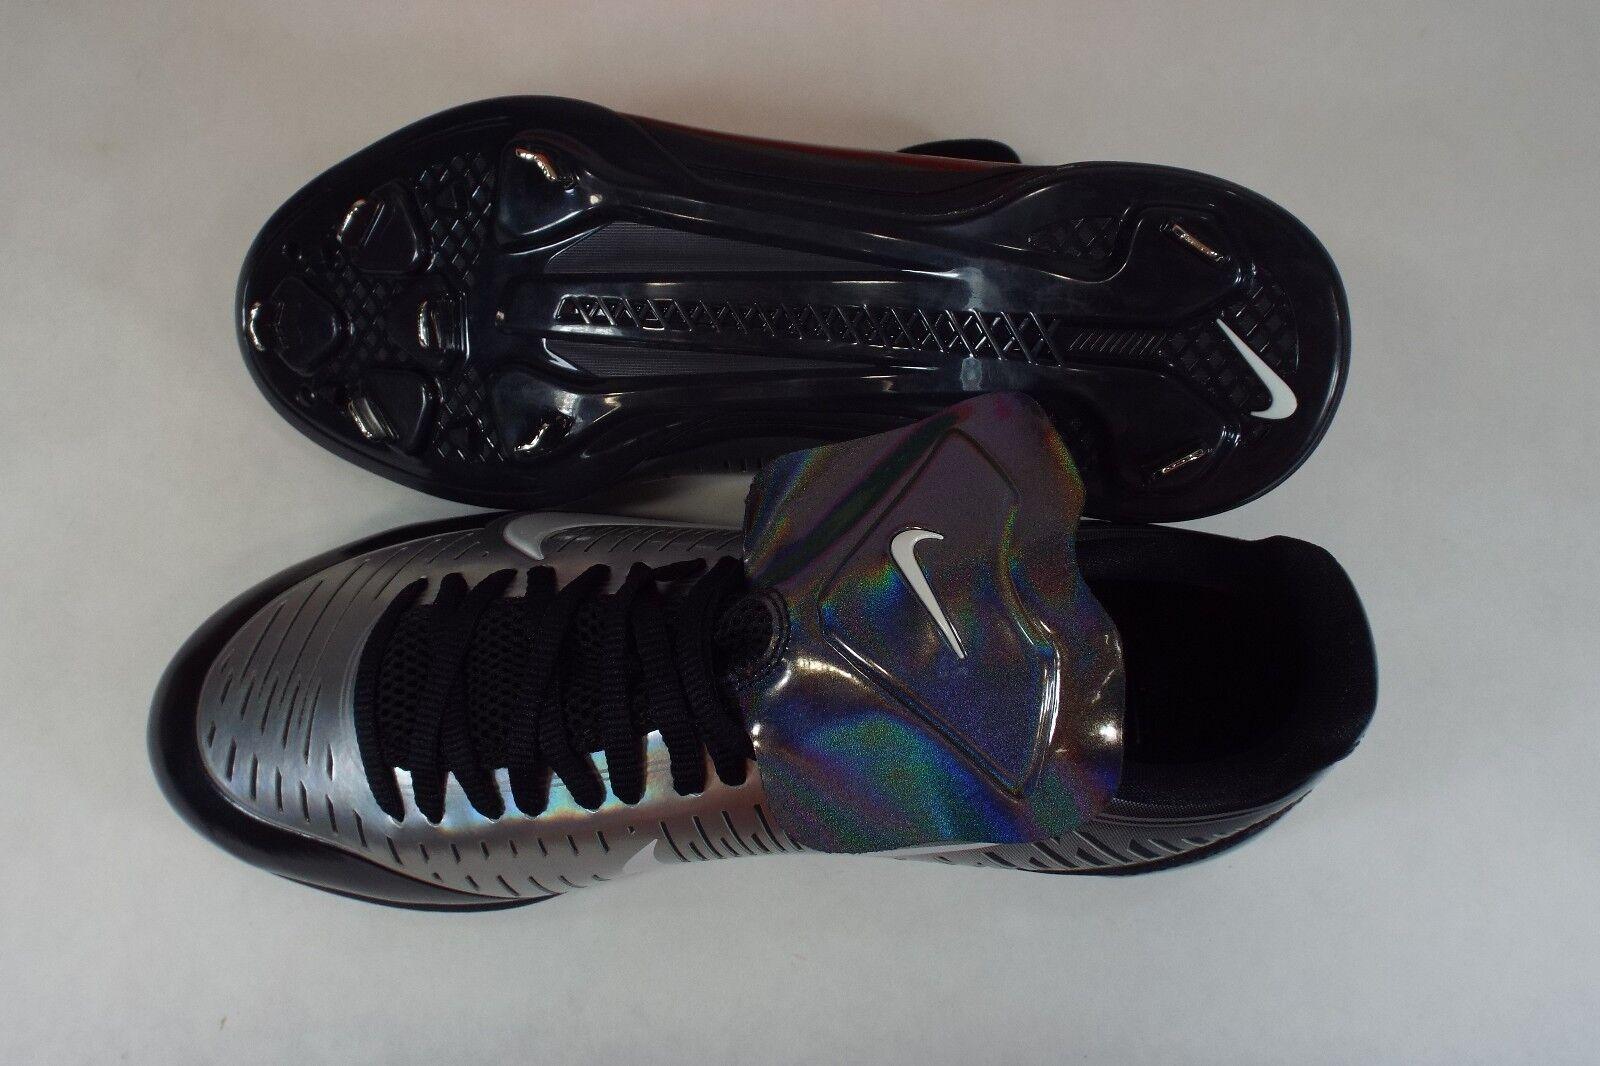 New New New Mens 9 NIKE Japan Shado Silver Black Metal Cleats Black 630719-410 be5cae